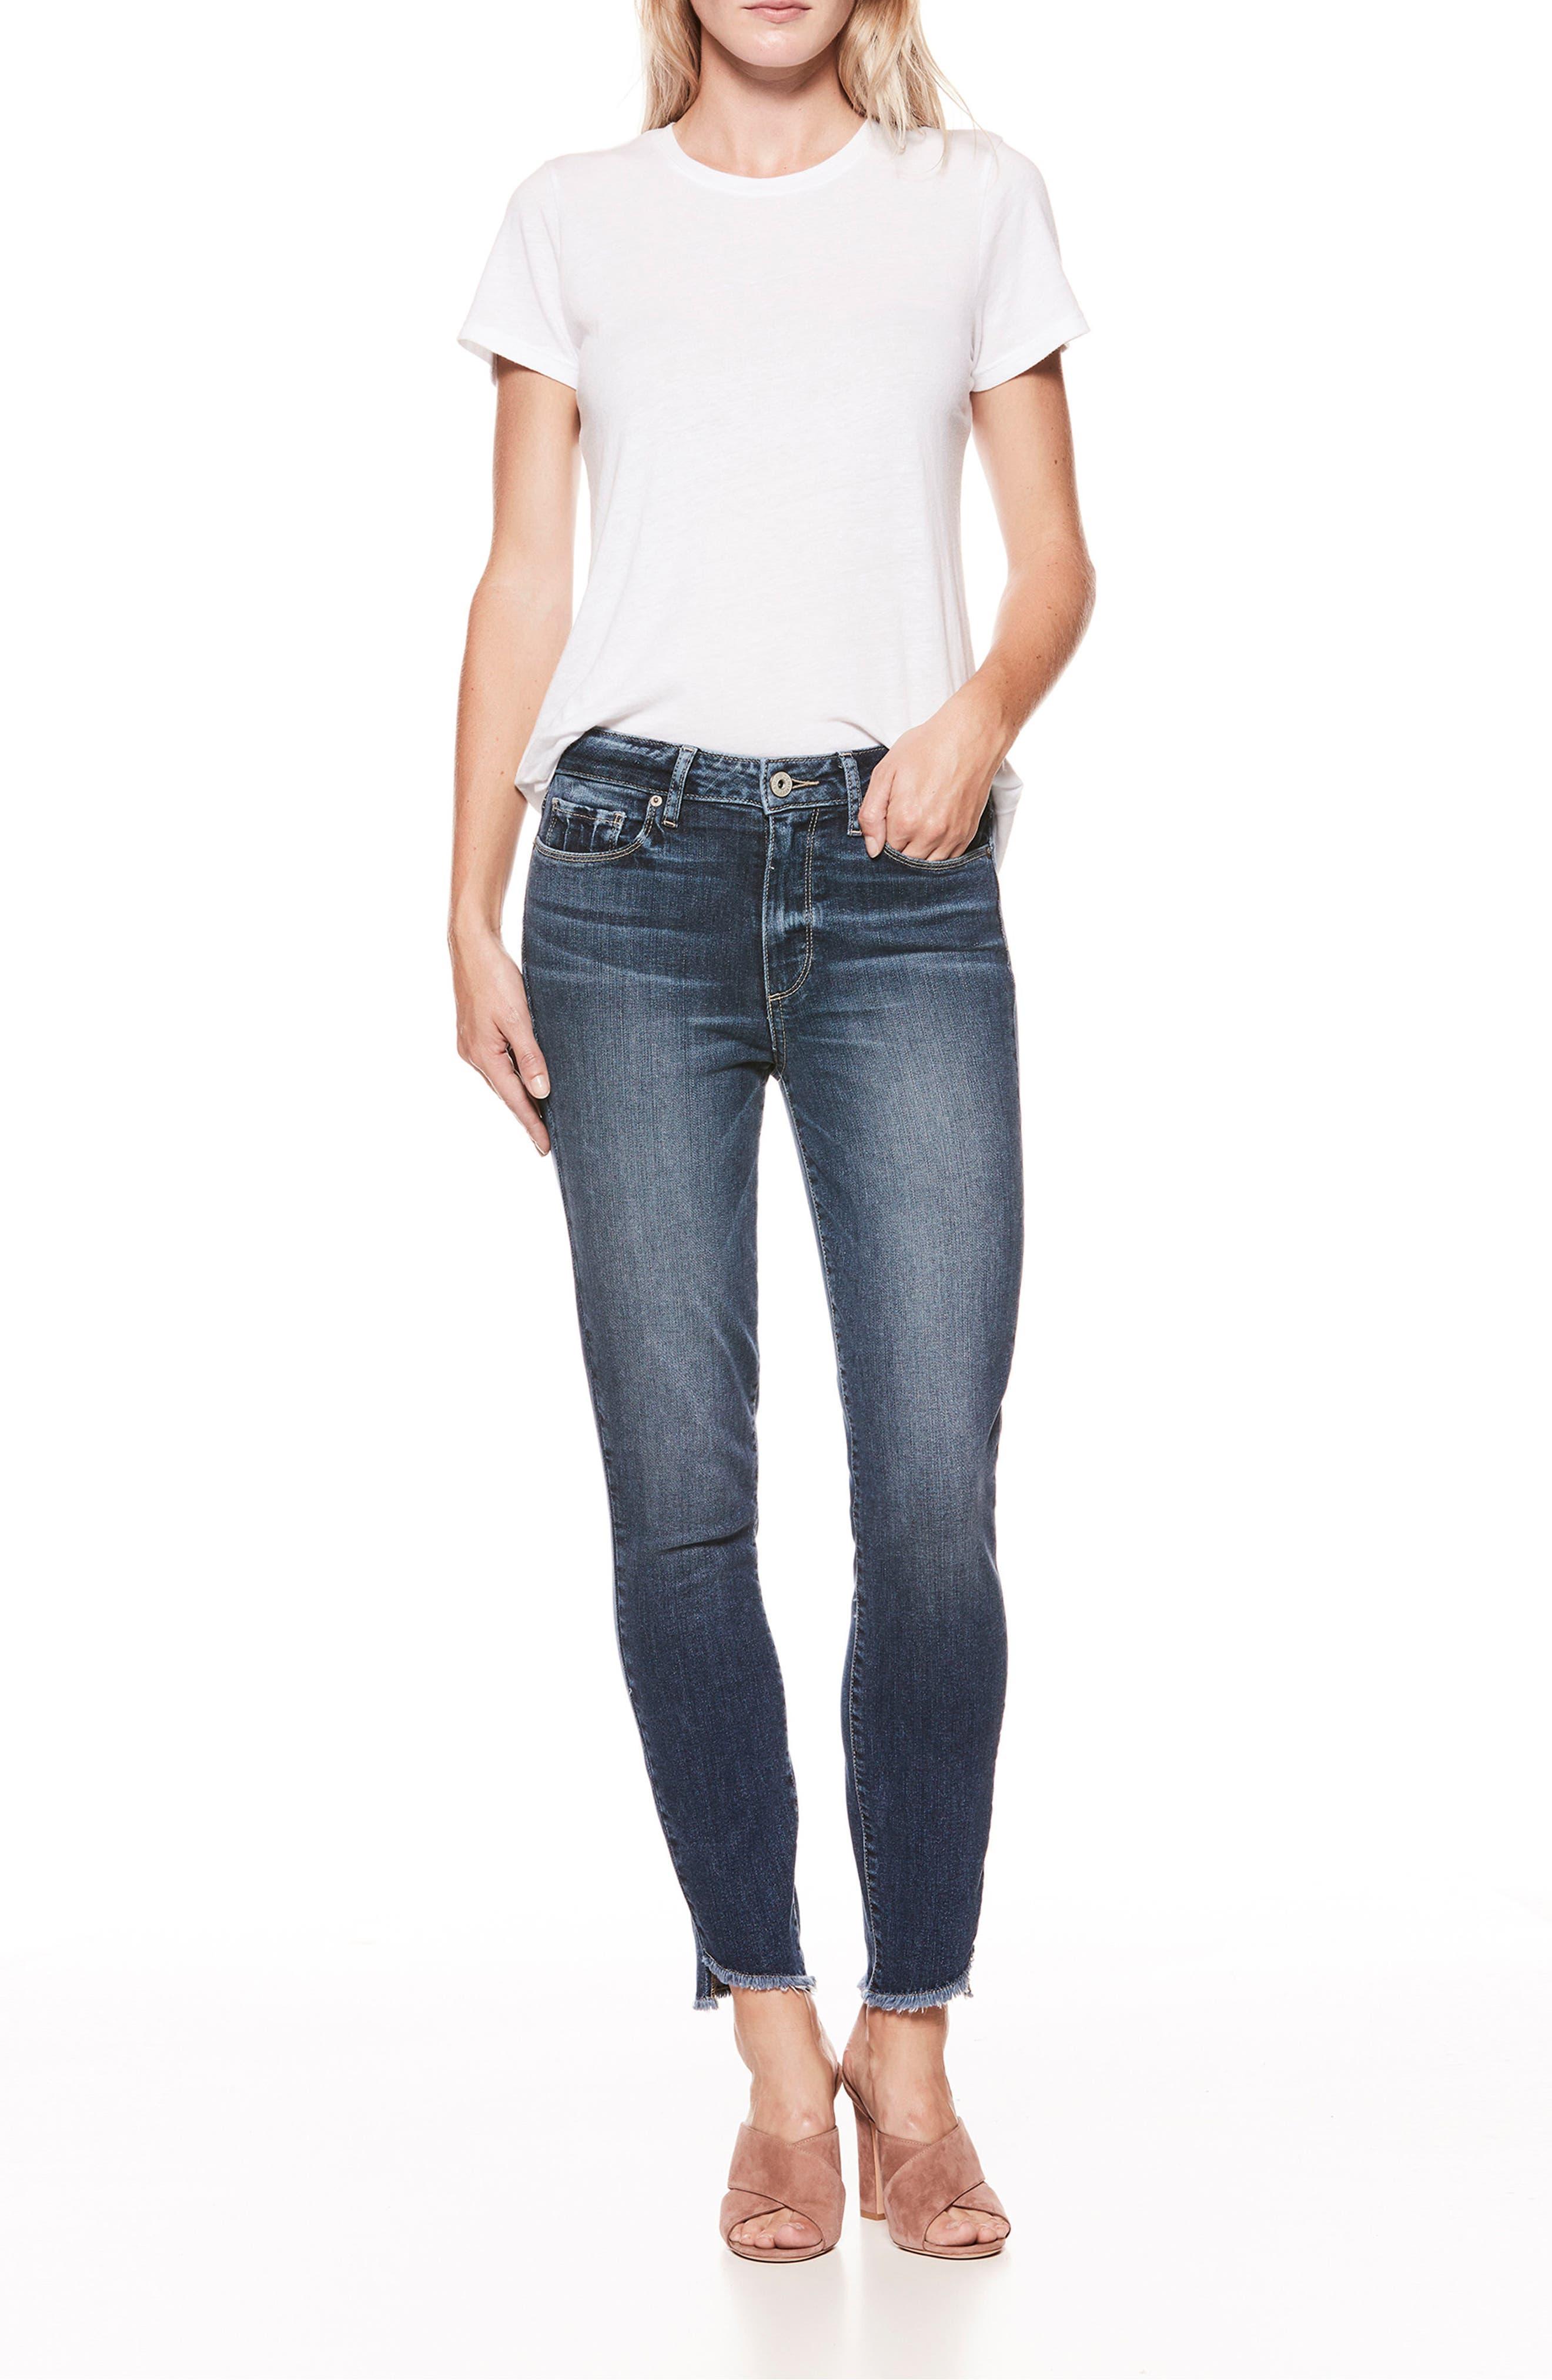 Hoxton High Waist Ankle Skinny Jeans,                             Alternate thumbnail 2, color,                             Blue